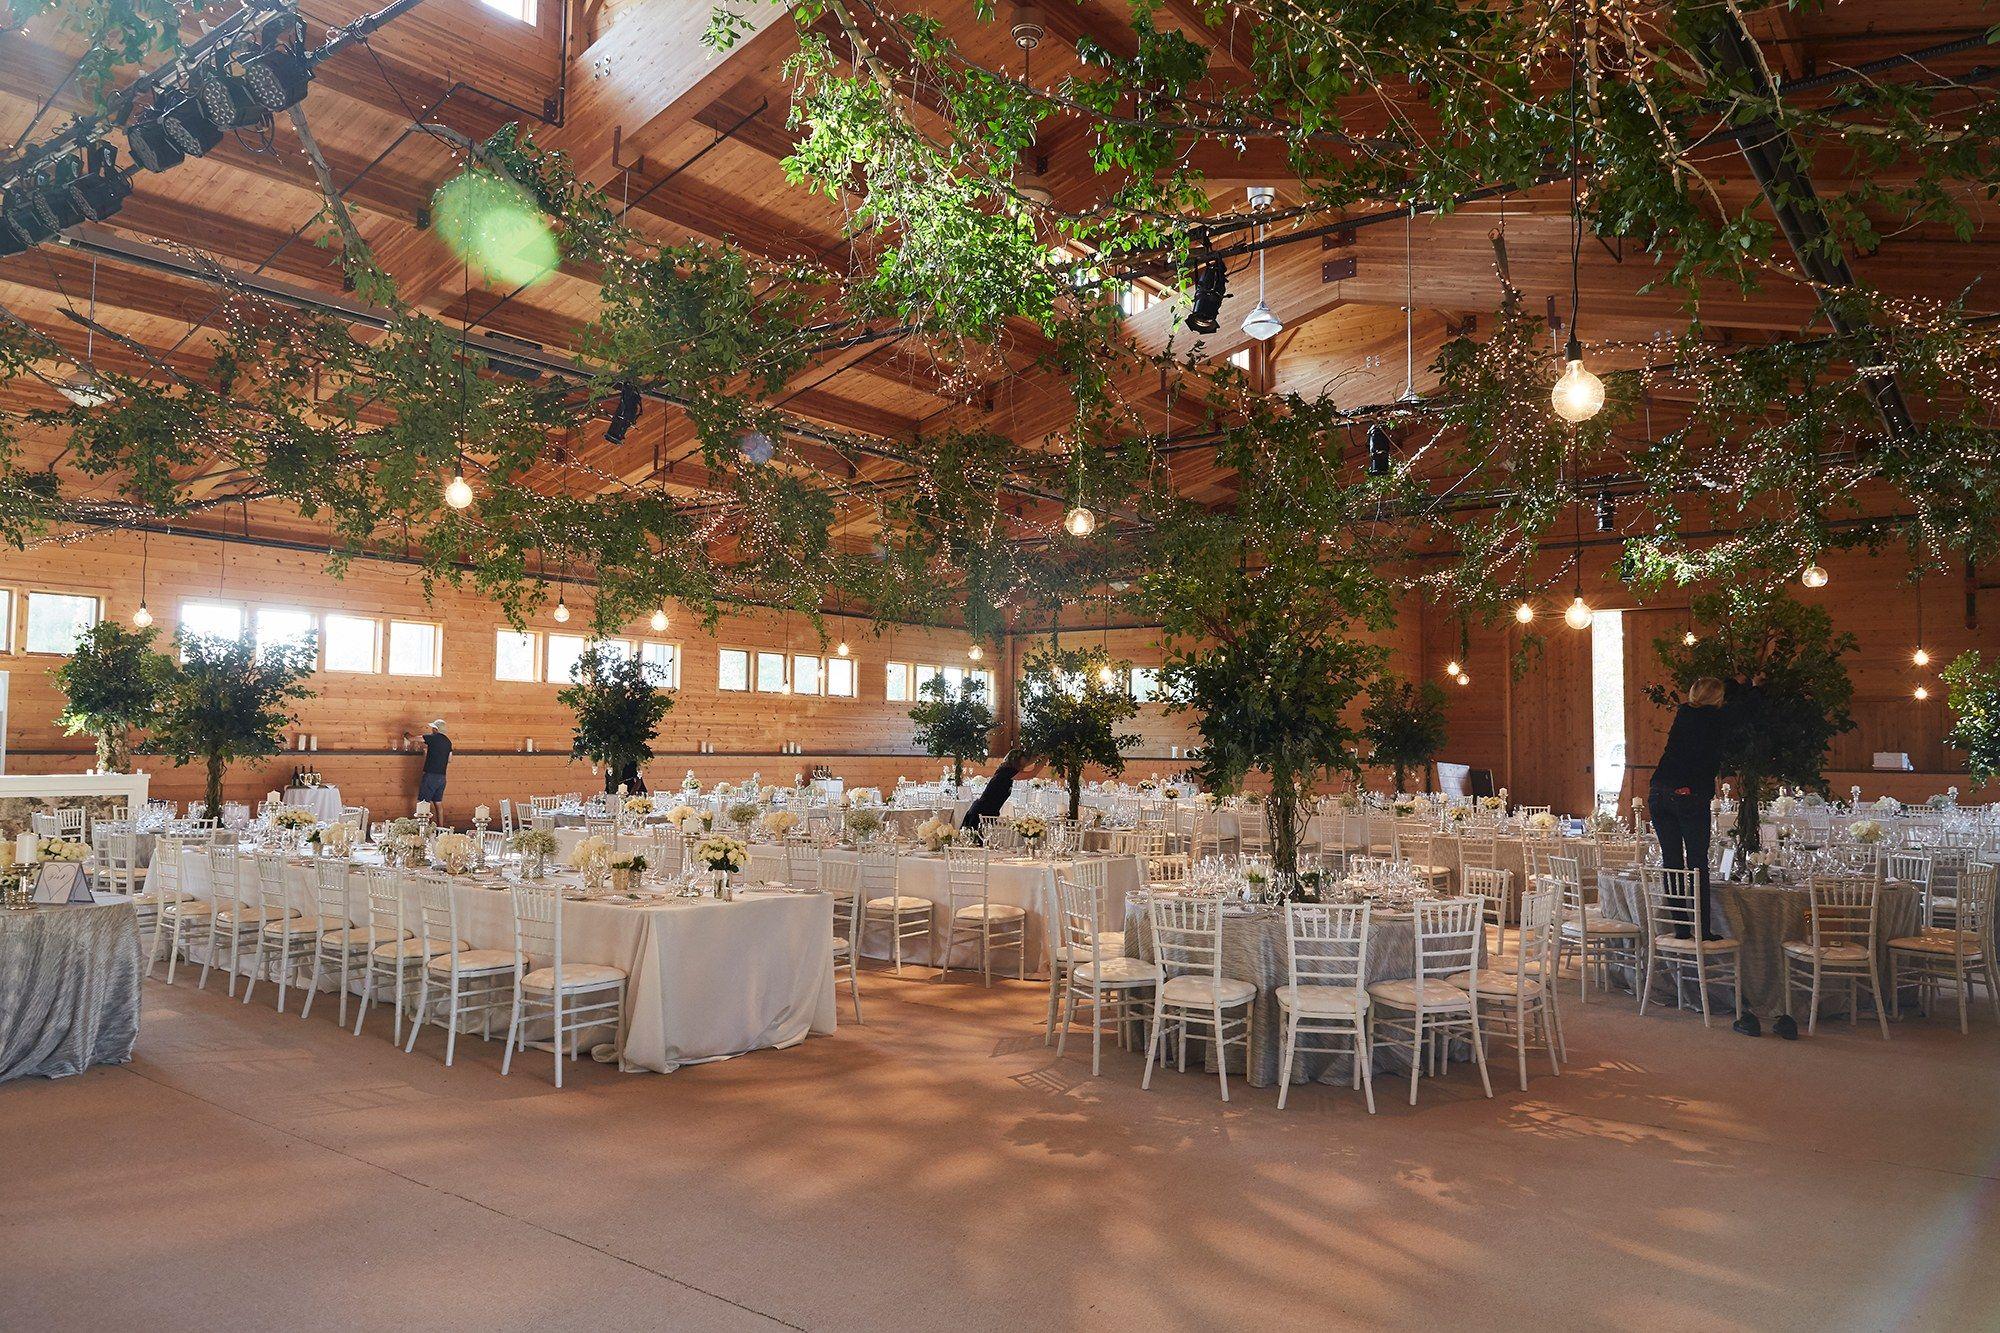 Pamela Tick S Understated Yet Elegant Wedding In Aspen Wedding Catering Near Me Wedding Venues In Virginia Elegant Wedding